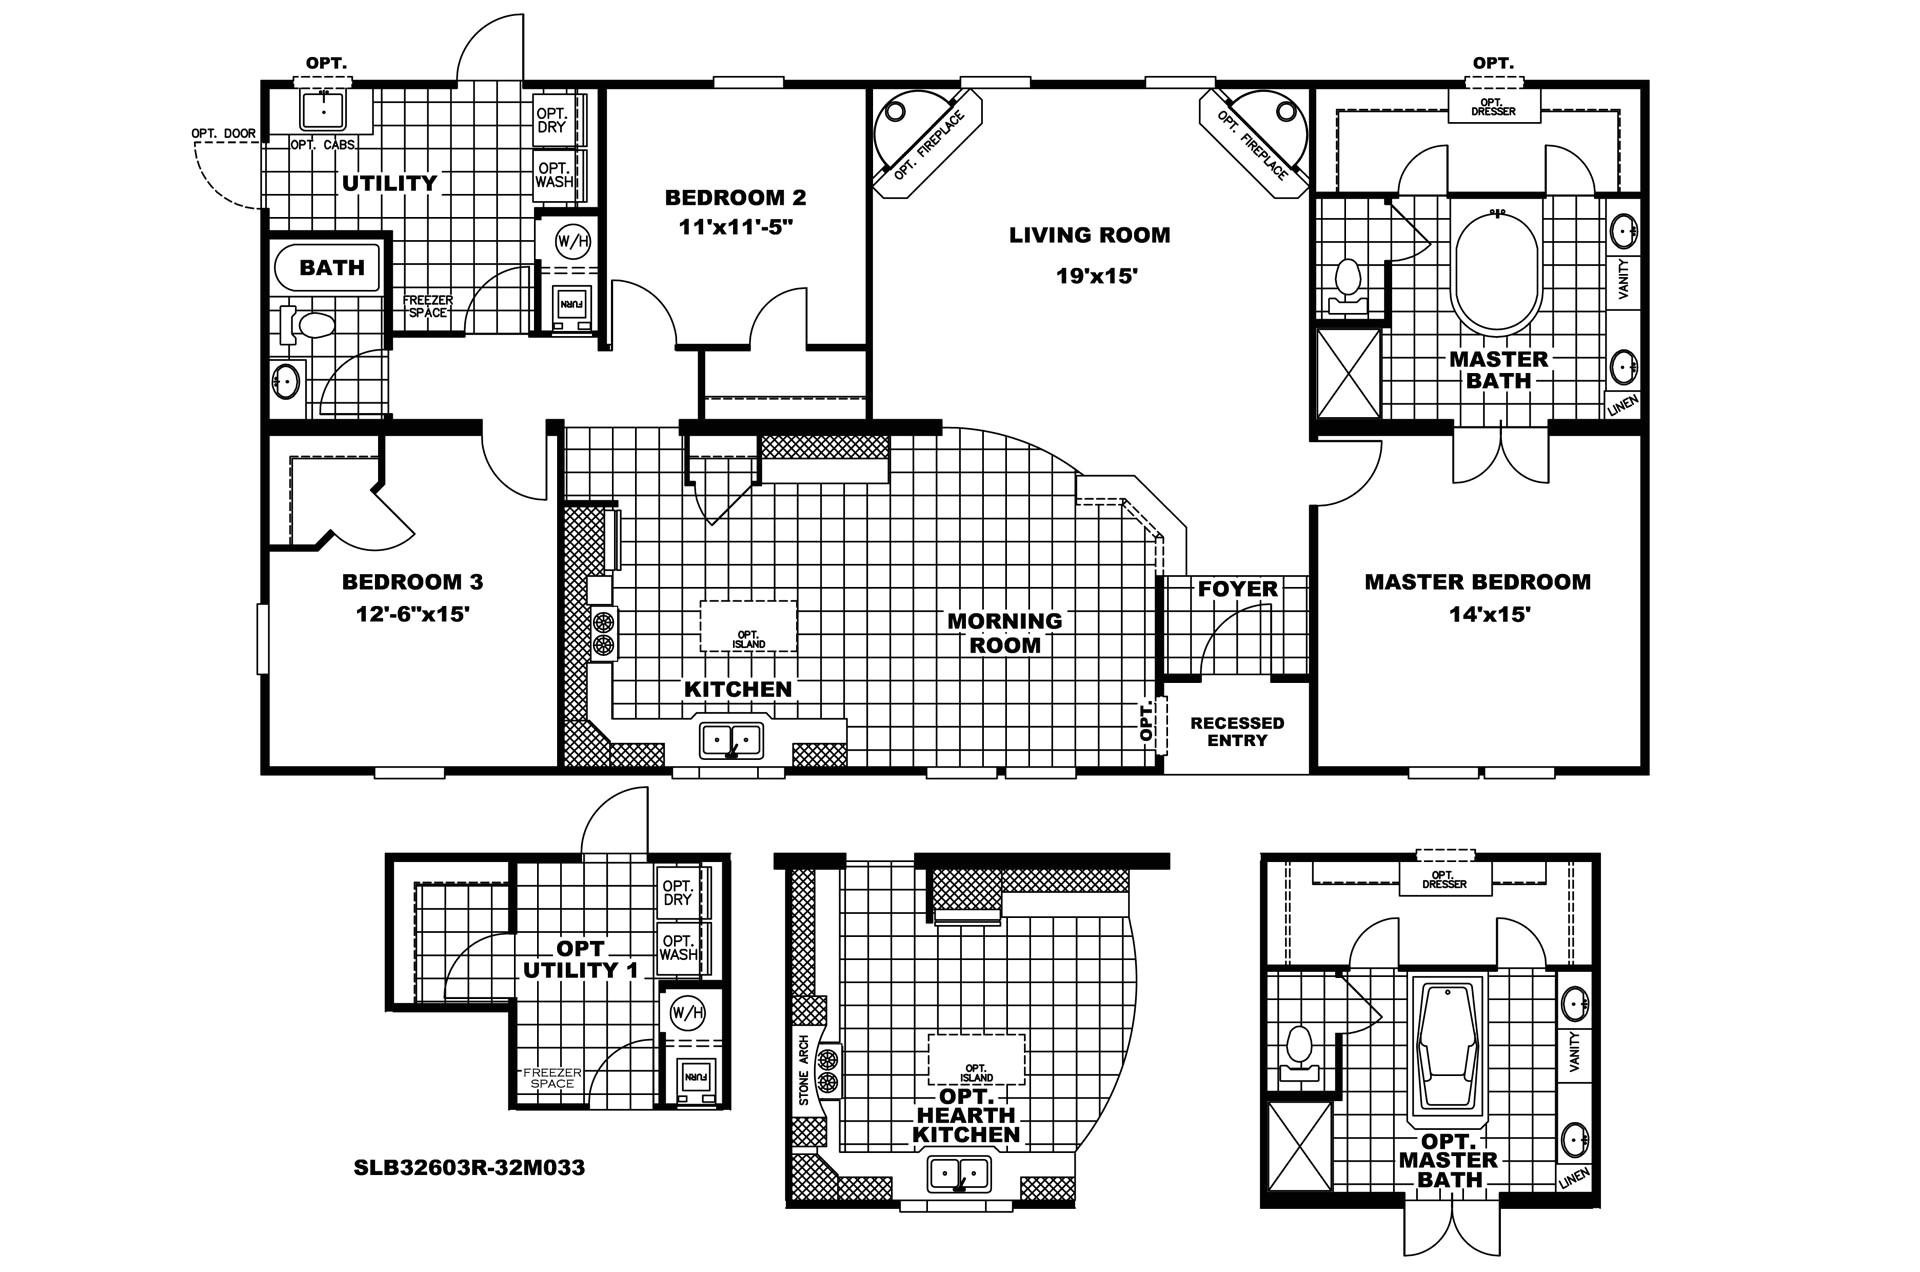 manufacturedhomefloorplan floorplan 3605